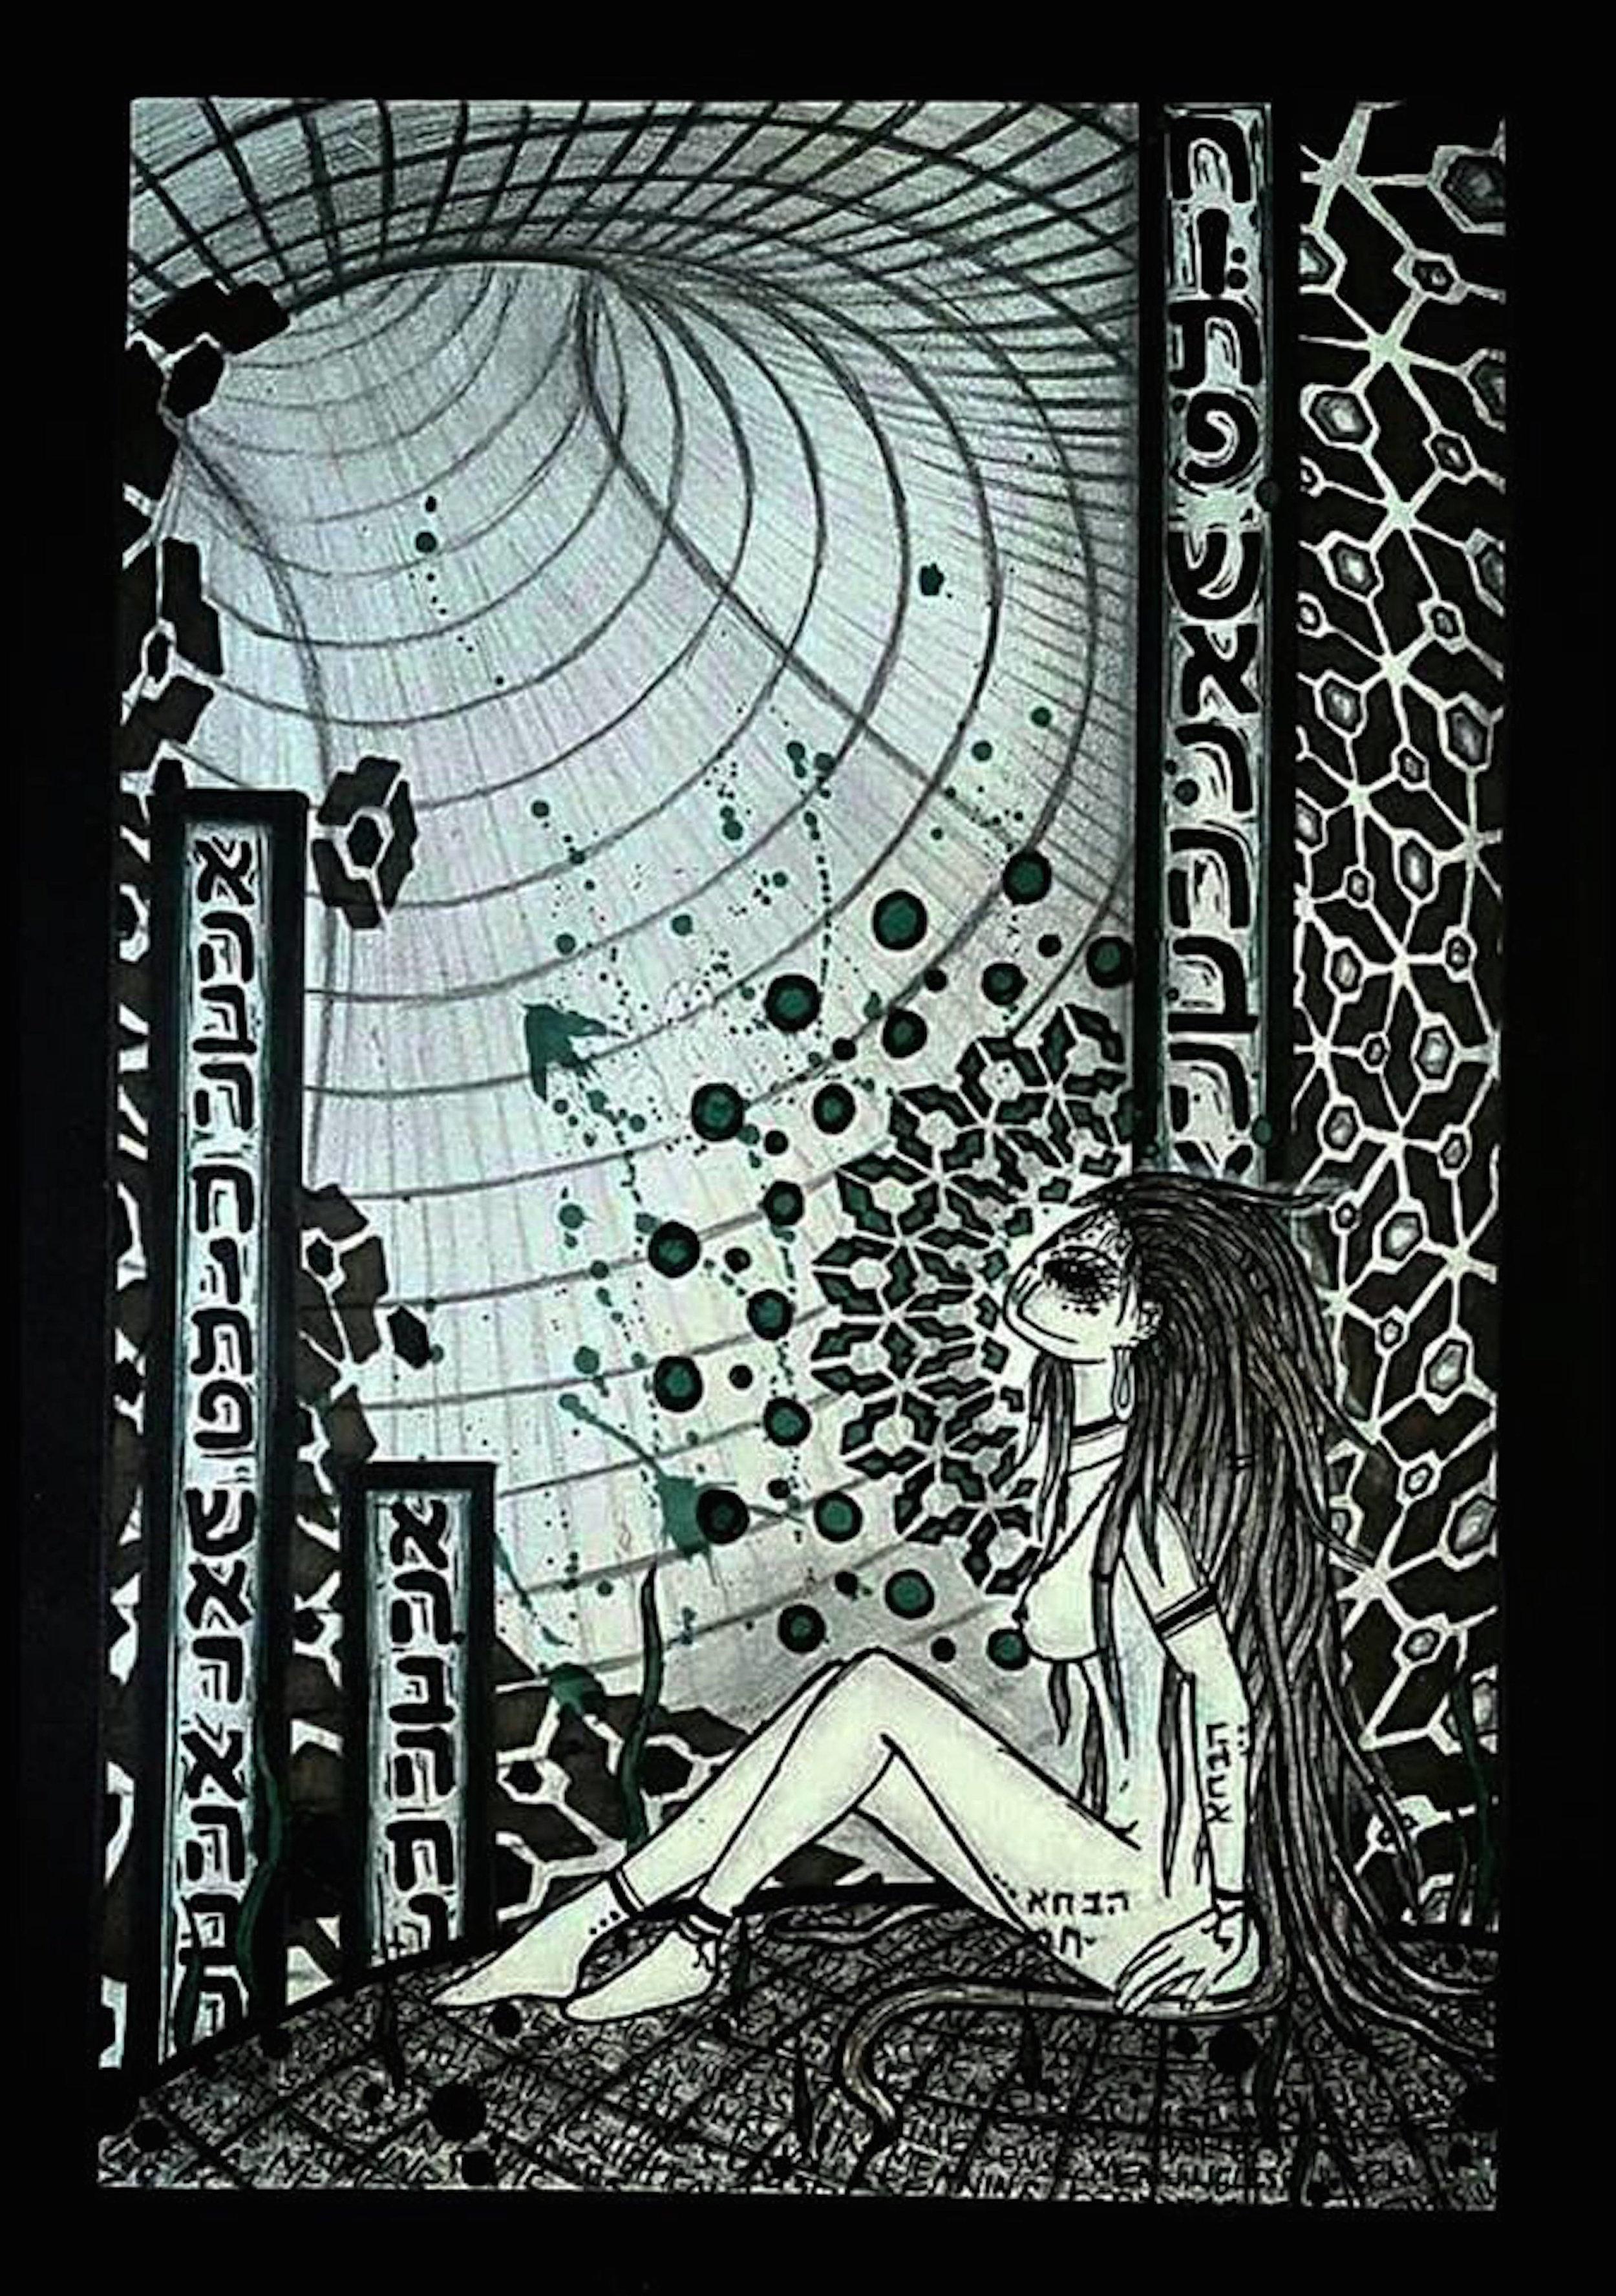 psychedelic art Jak Nola 03.jpg